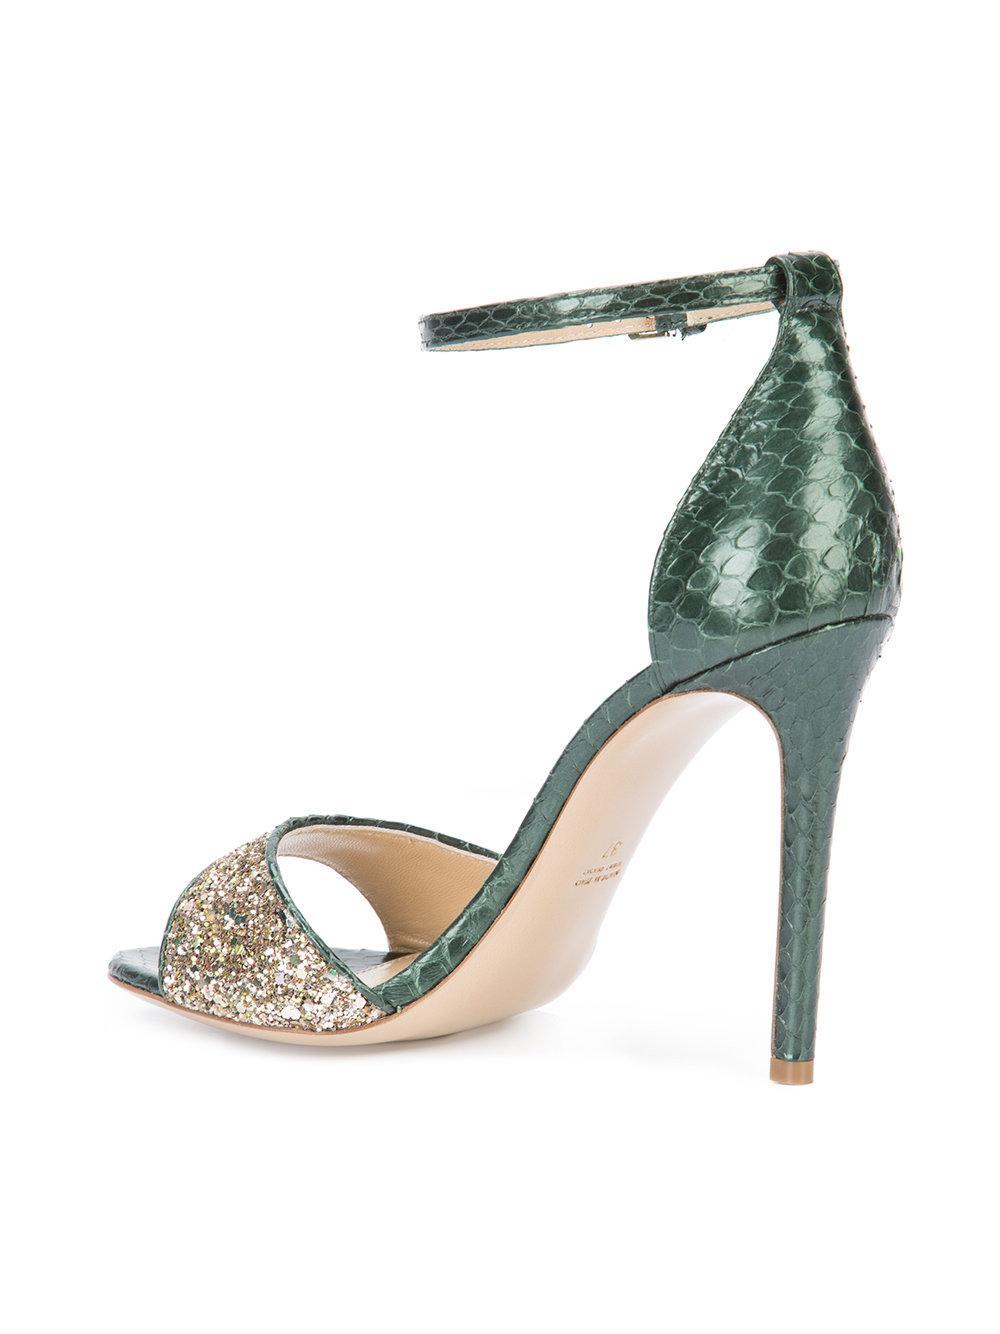 glitter sandals - Green Monique Lhuillier ZVMQz6